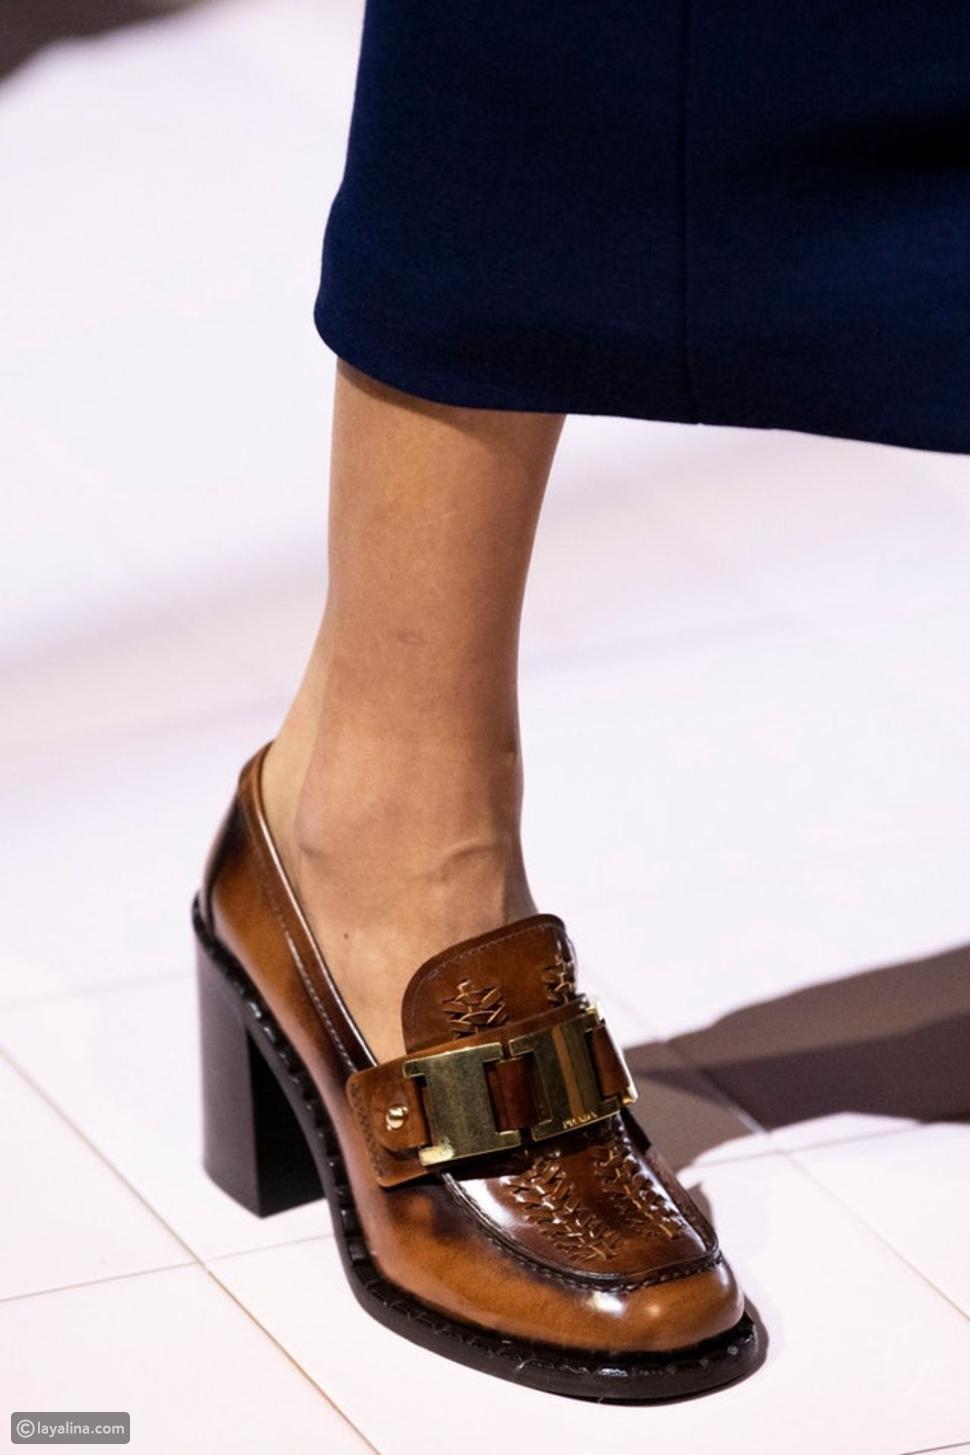 حذاء Loafers من برادا prada